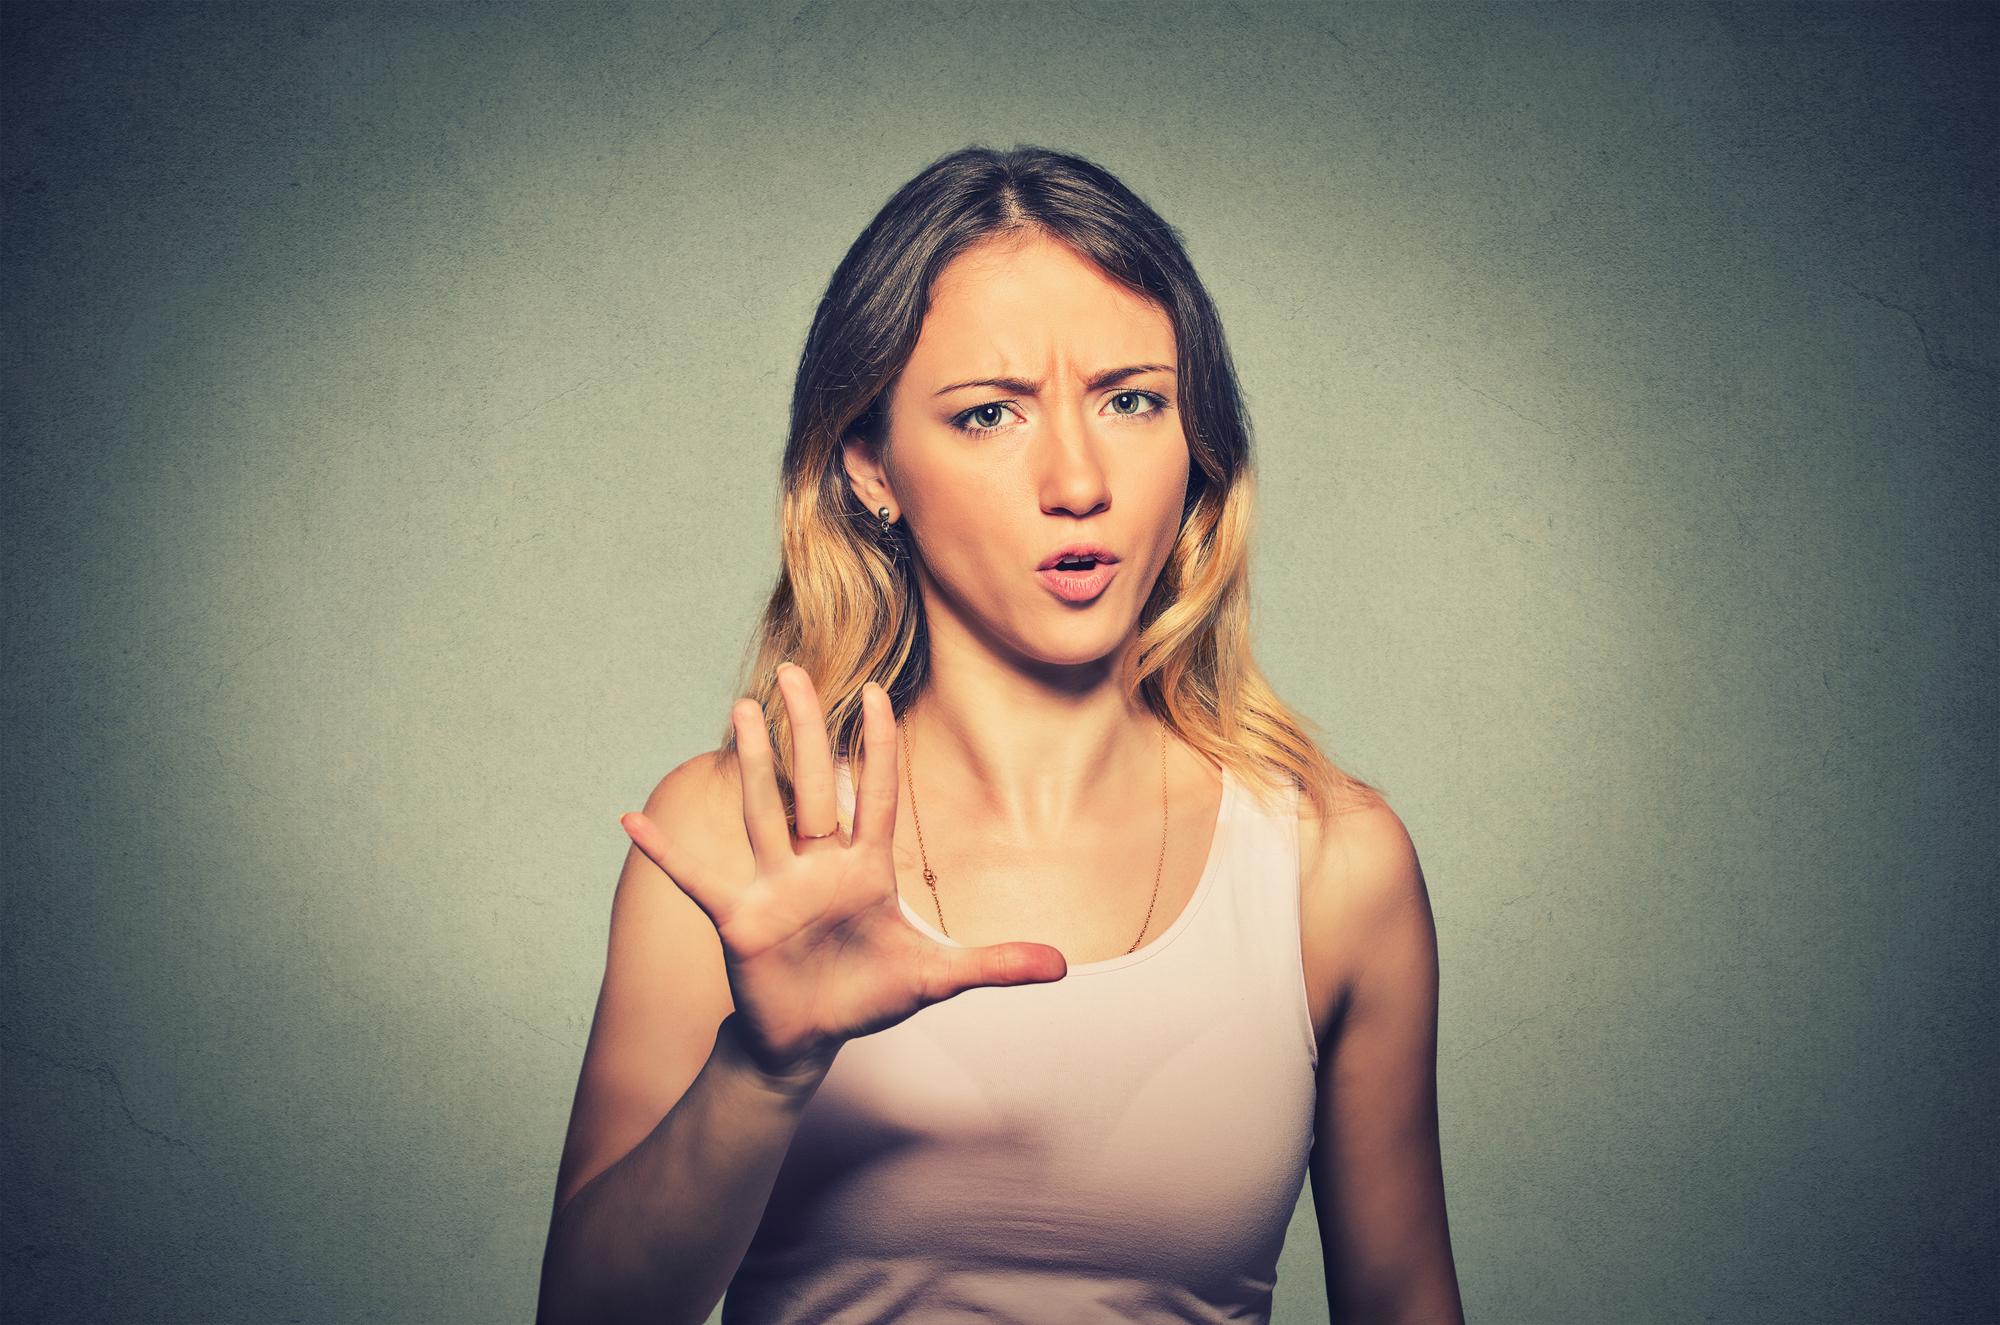 Reactance effect: sterker bij gedachtencontrole of bij gedragscontrole?